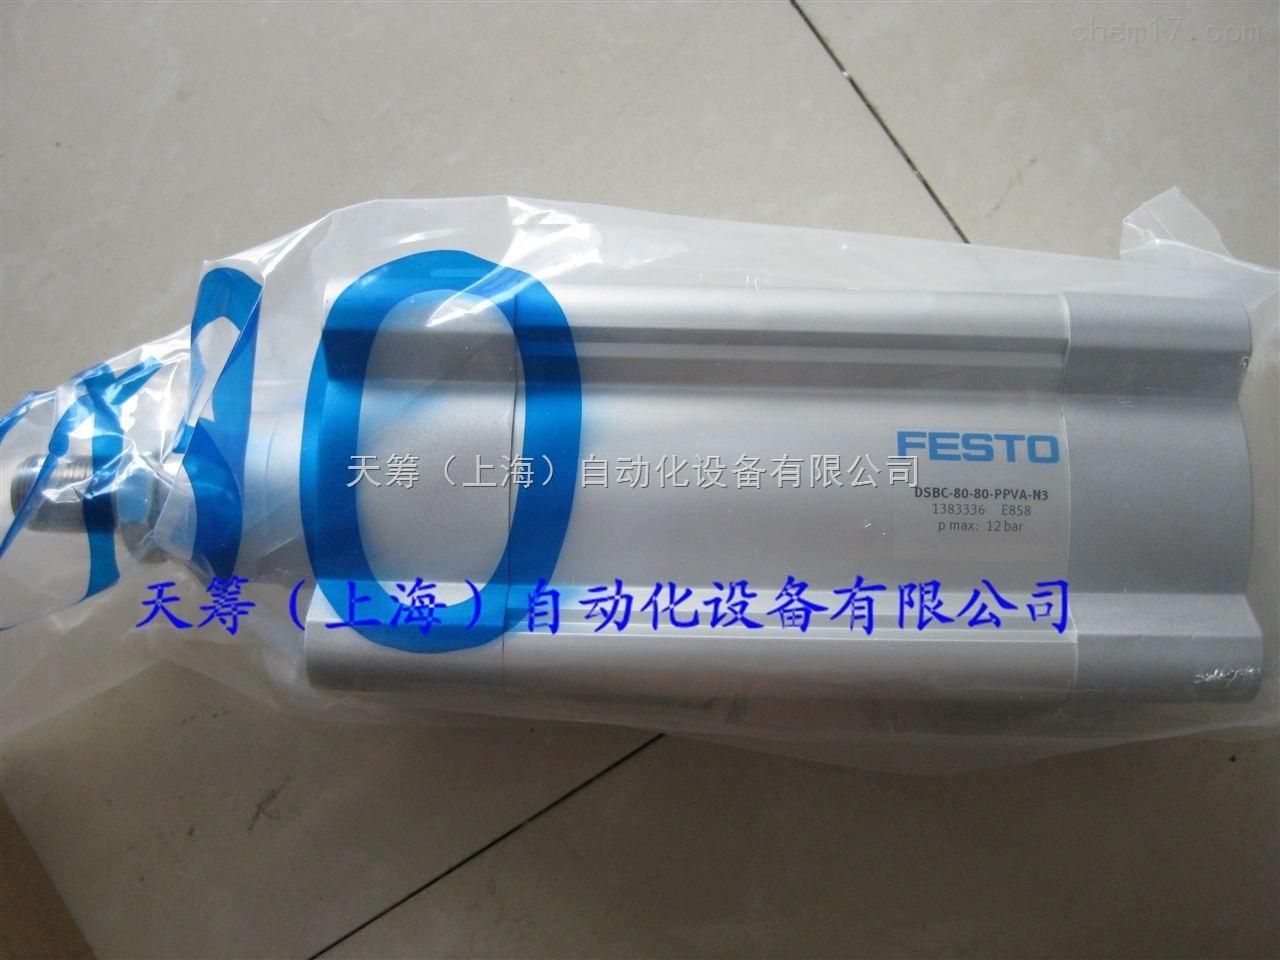 FESTO标准气缸DSBC-80-80-PPVA-N3